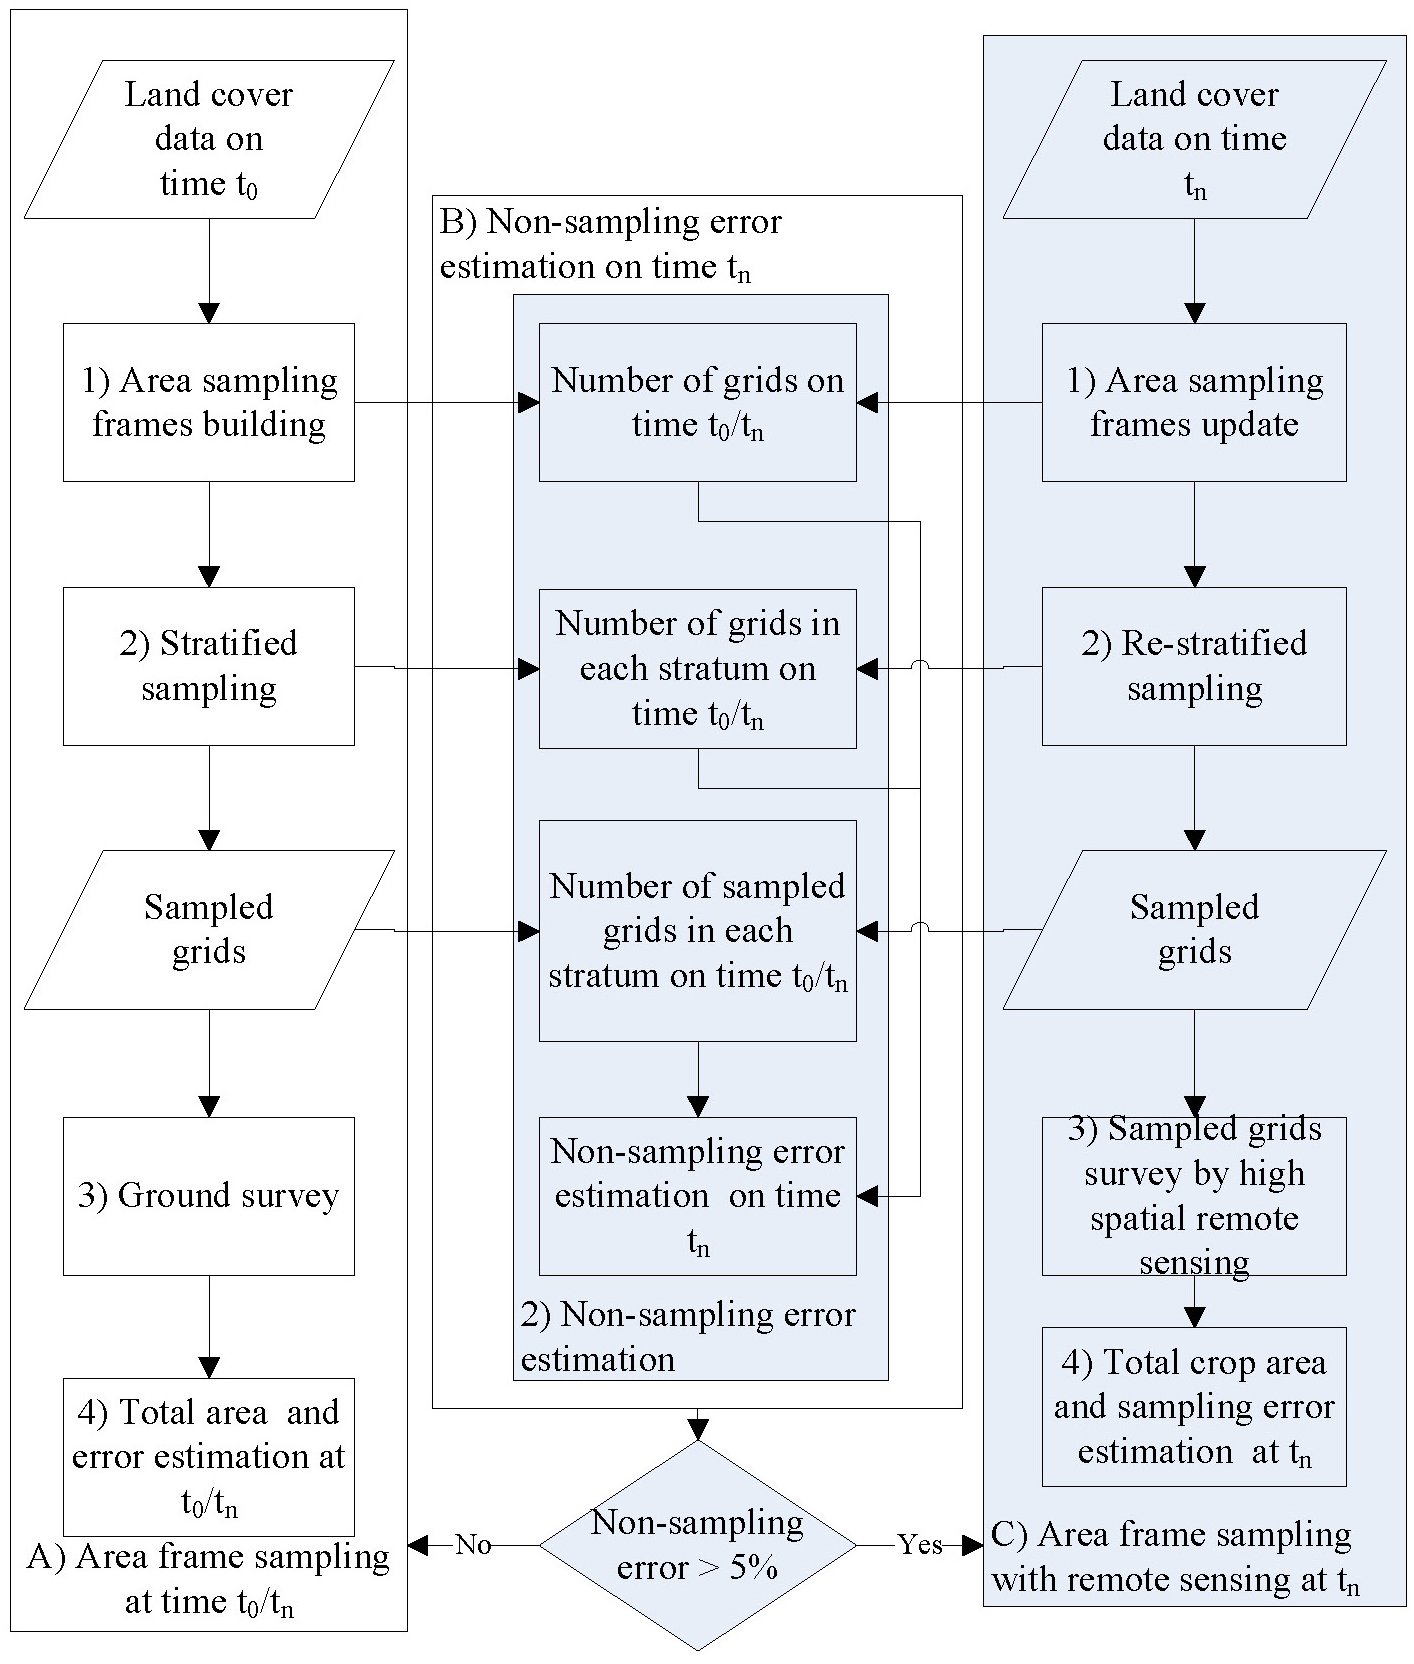 An index of non-sampling error in area frame sampling based on ...